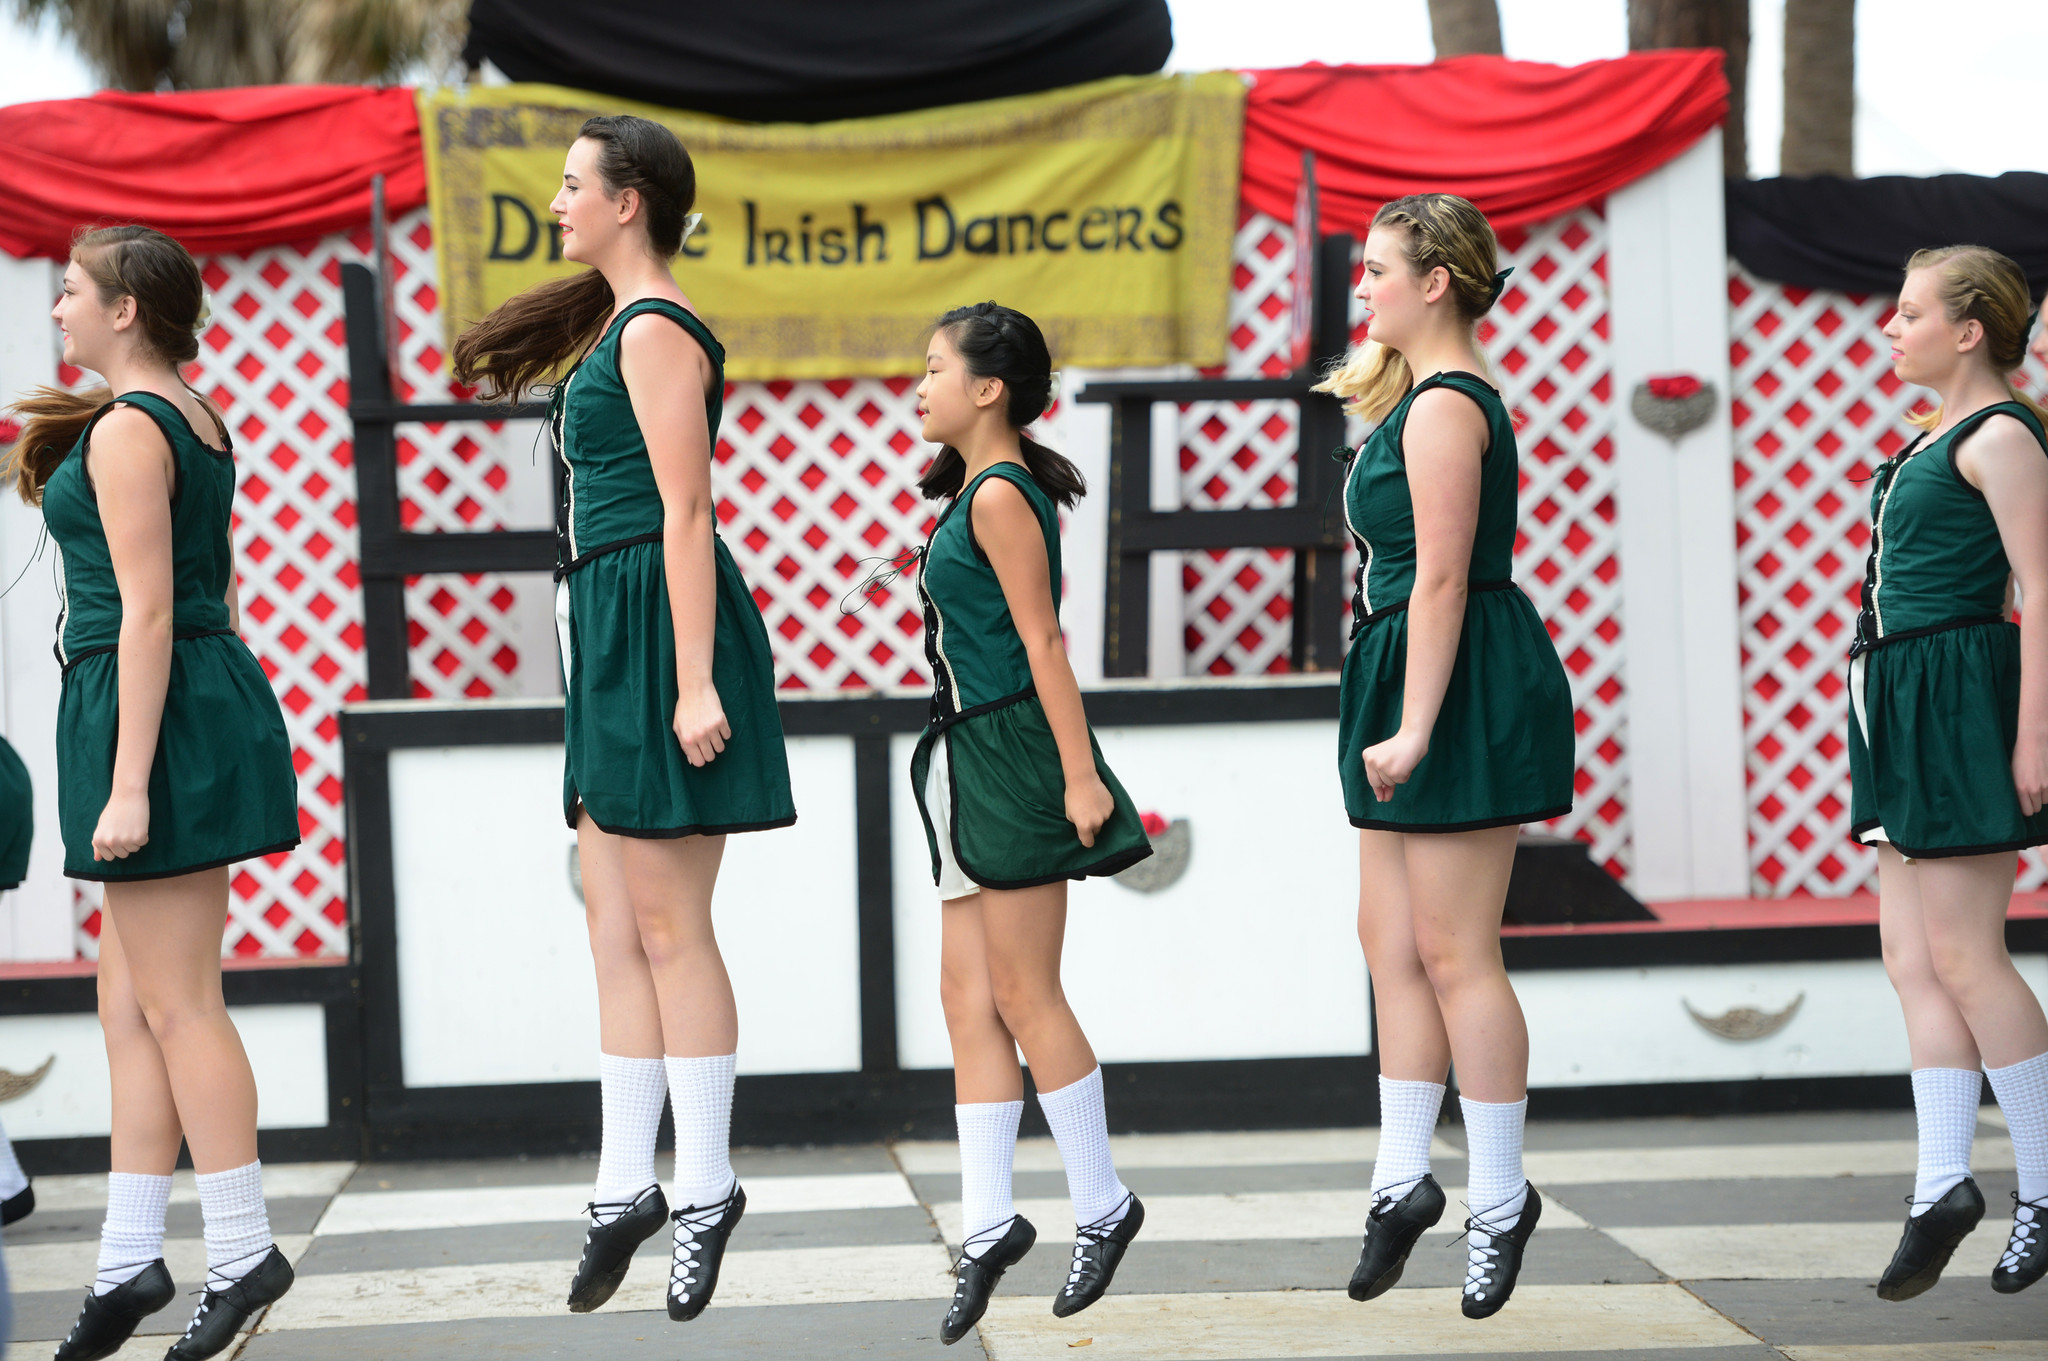 Renaissance Festival photos - Drake Irish Dancers